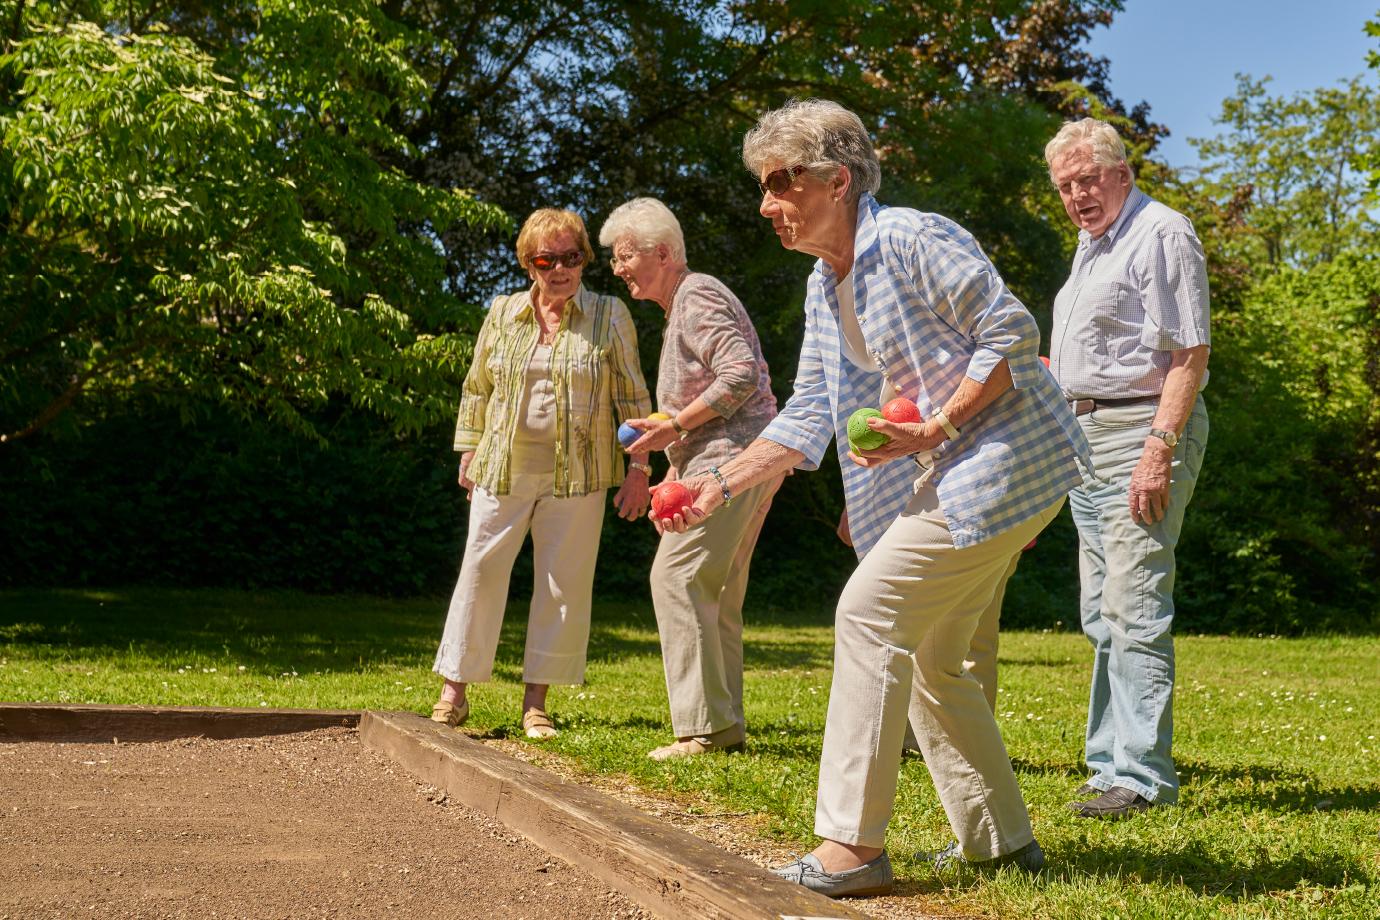 Aktiv leben: Boule-Spiel im Park